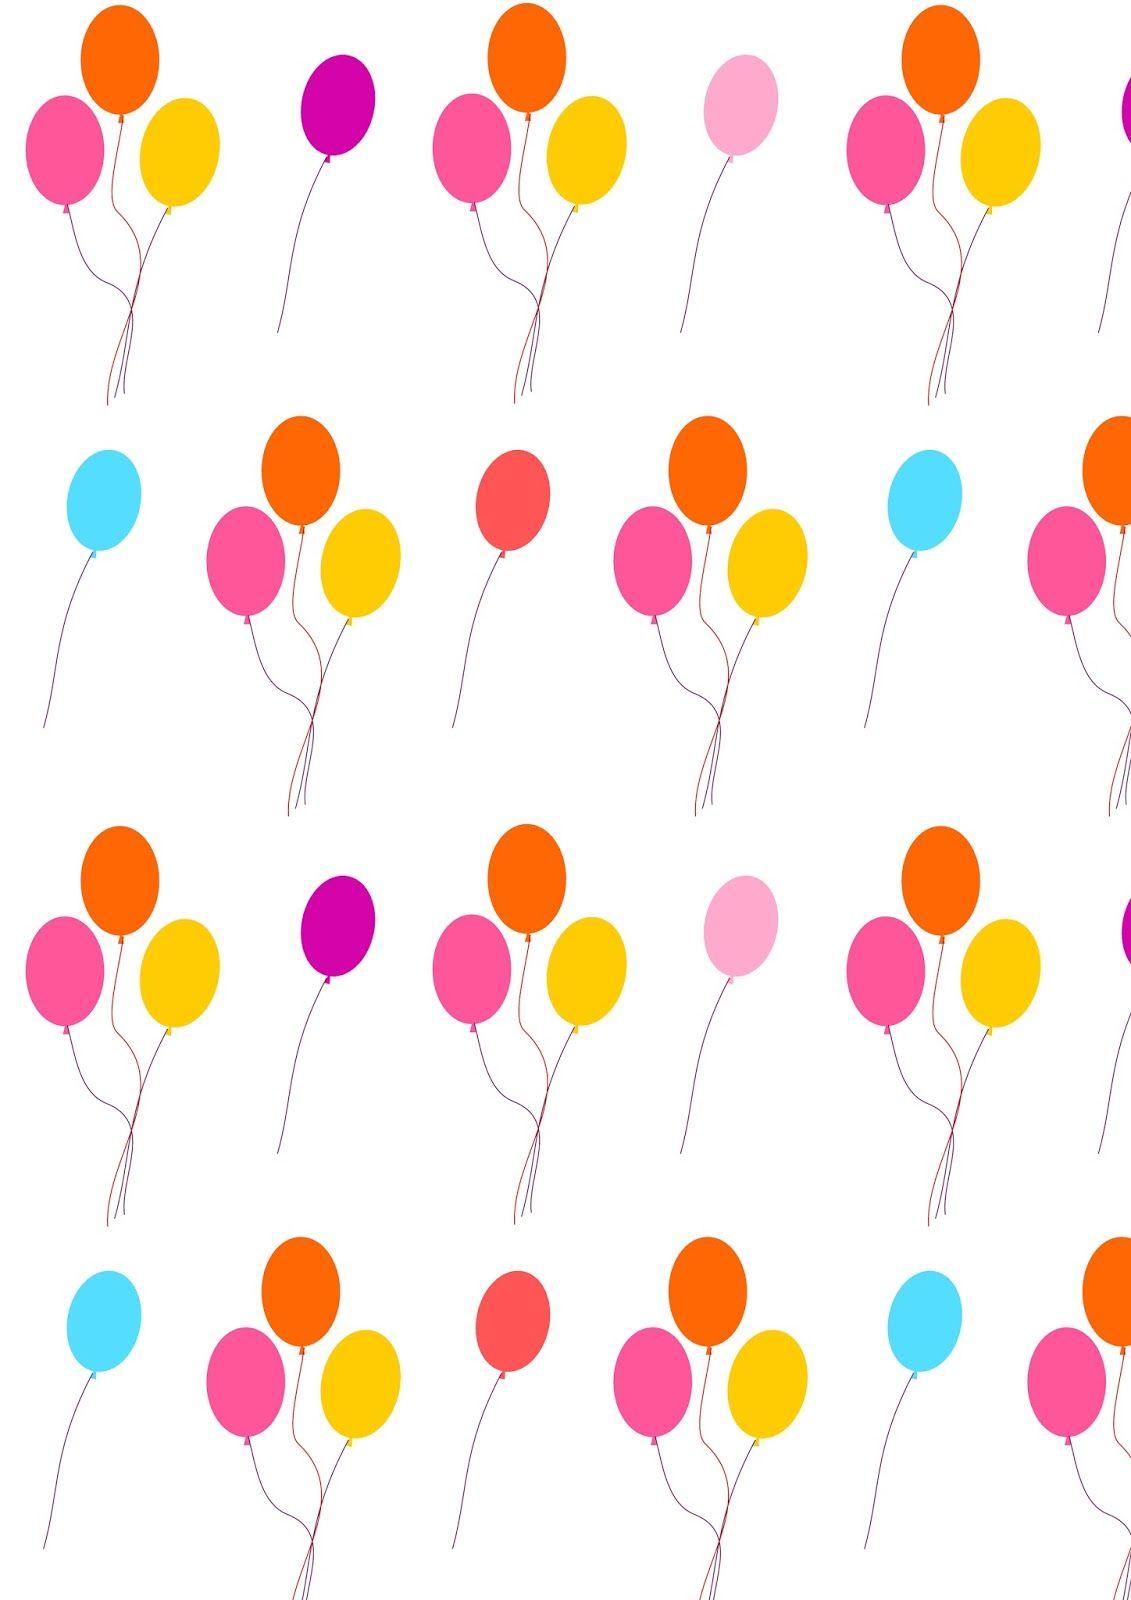 Printable Birthday Balloons ~ Free printable balloon pattern paper happybirthday printables pinterest